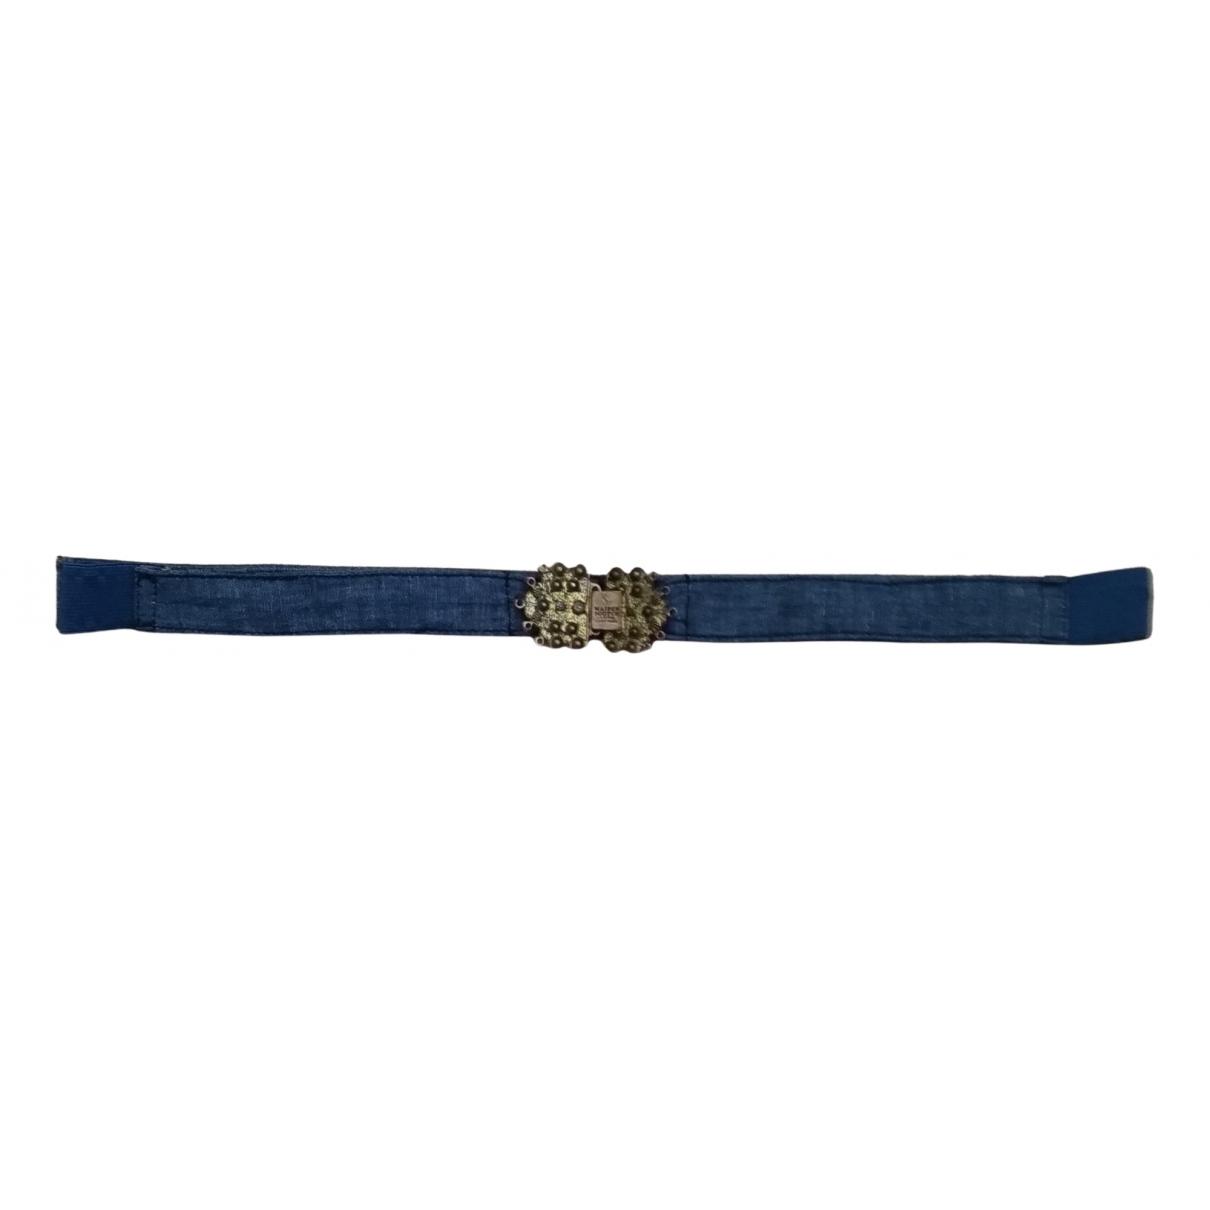 Maison Scotch \N Blue Cotton belt for Women S International